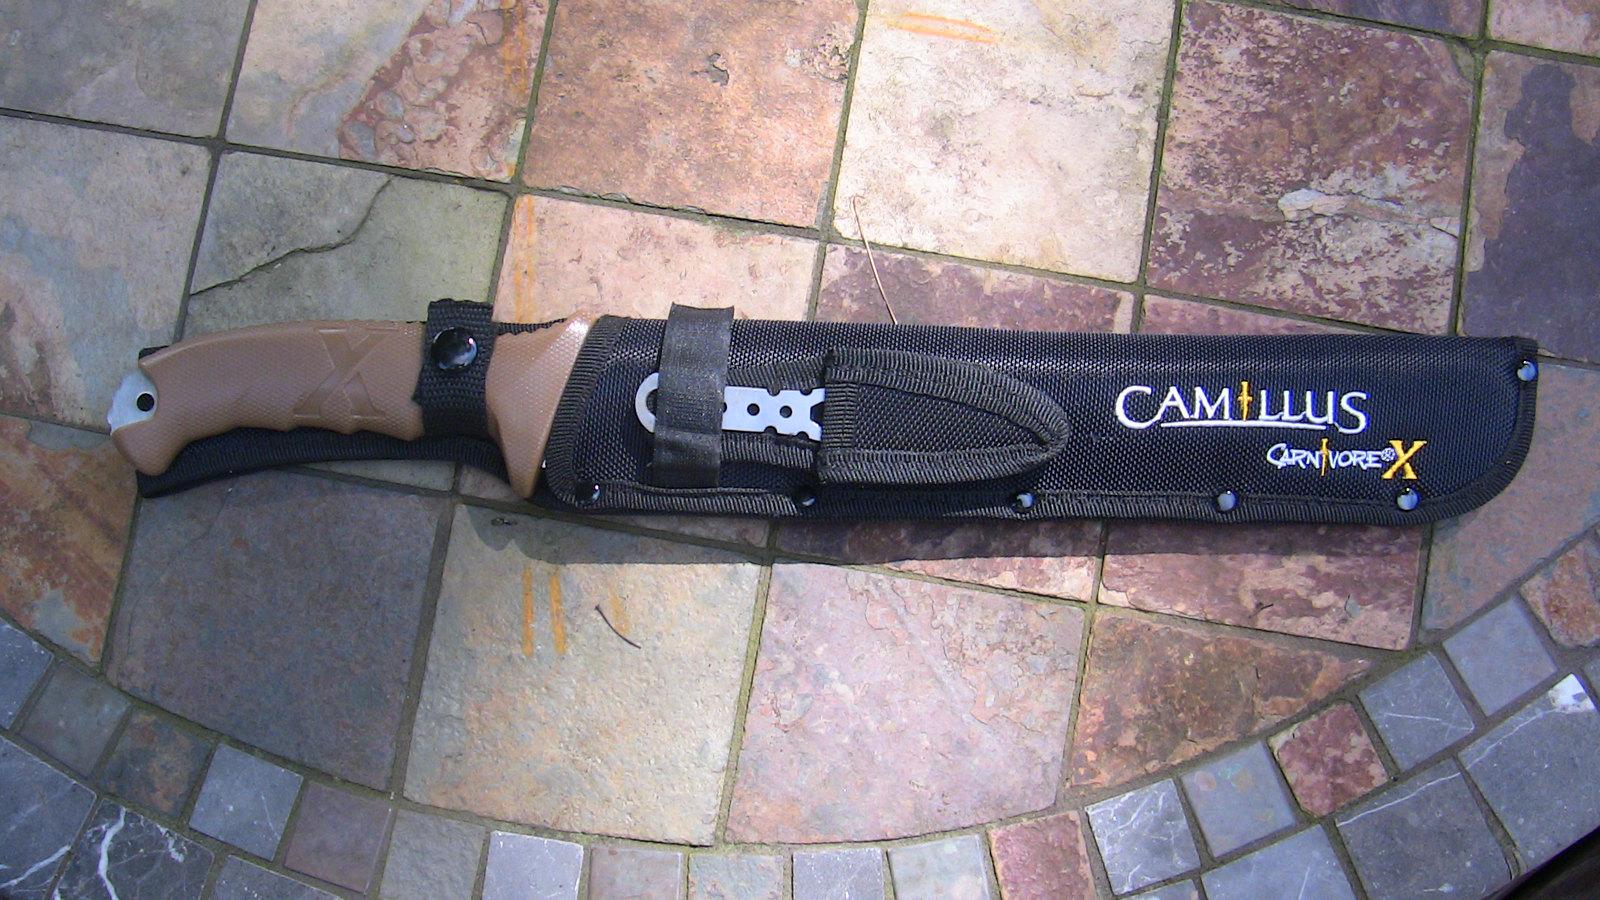 camillus carnivore-x review | Bushcraft USA Forums